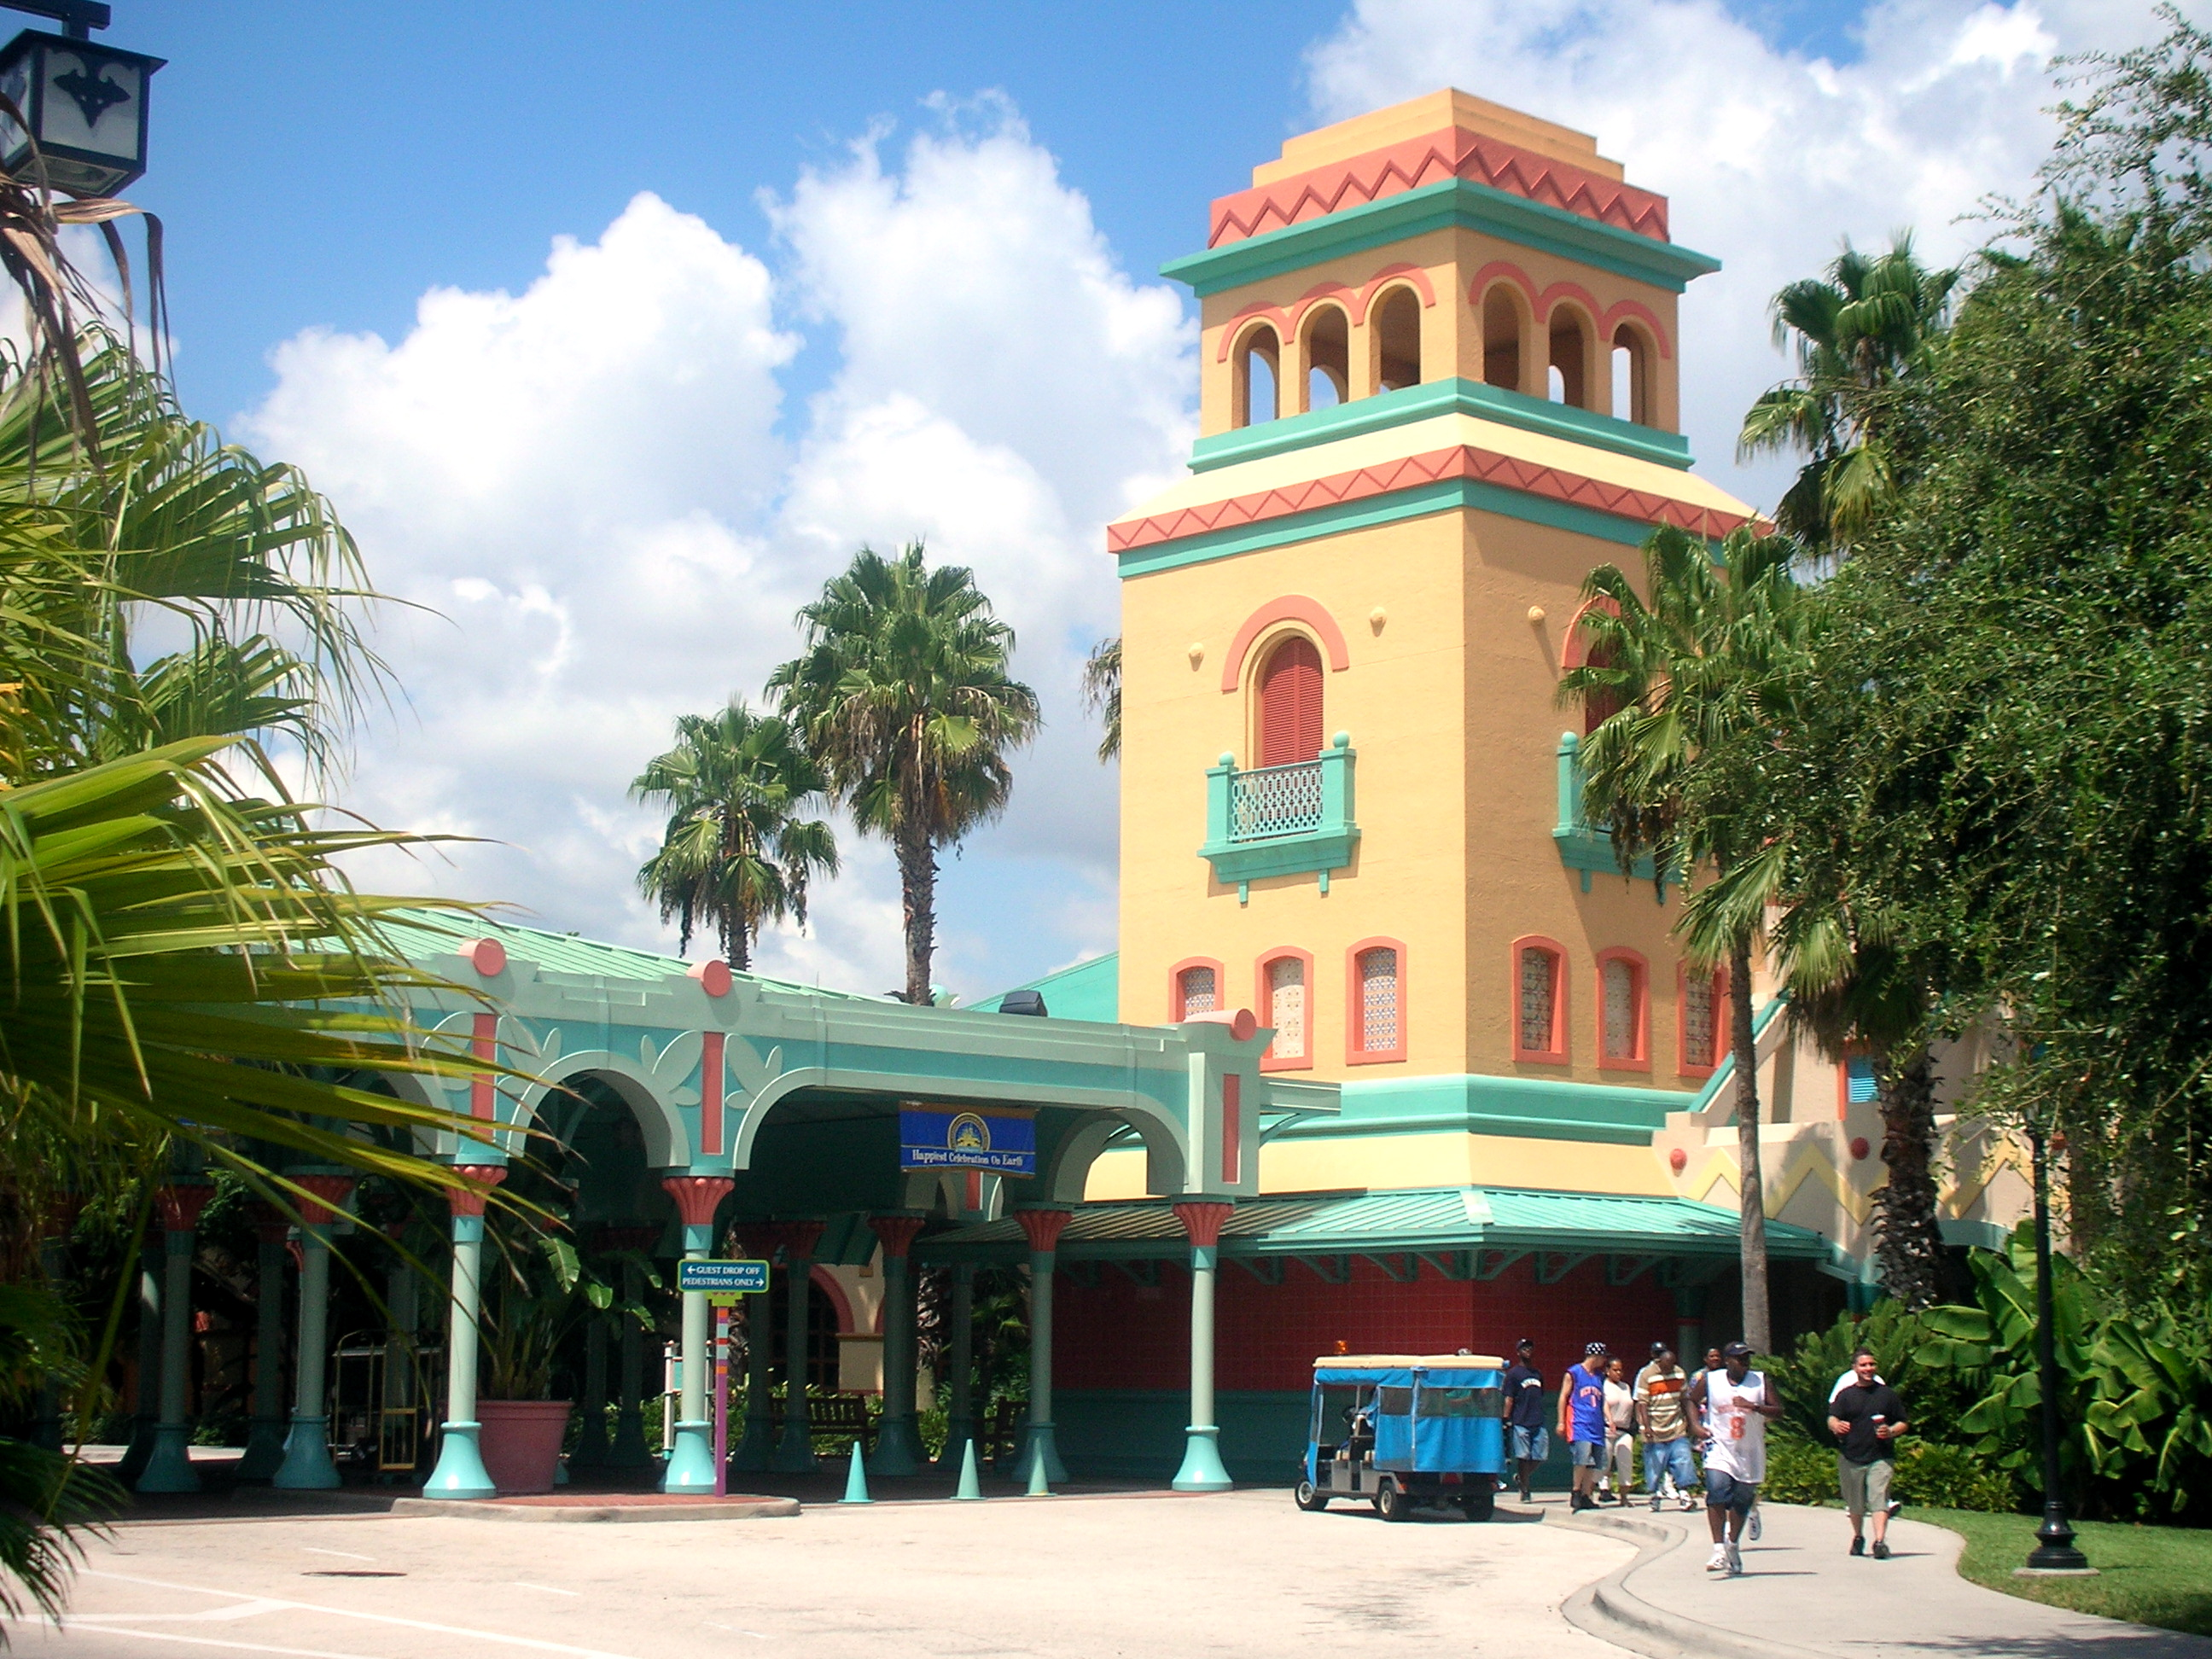 Hotels Near Disney Parks Orlando